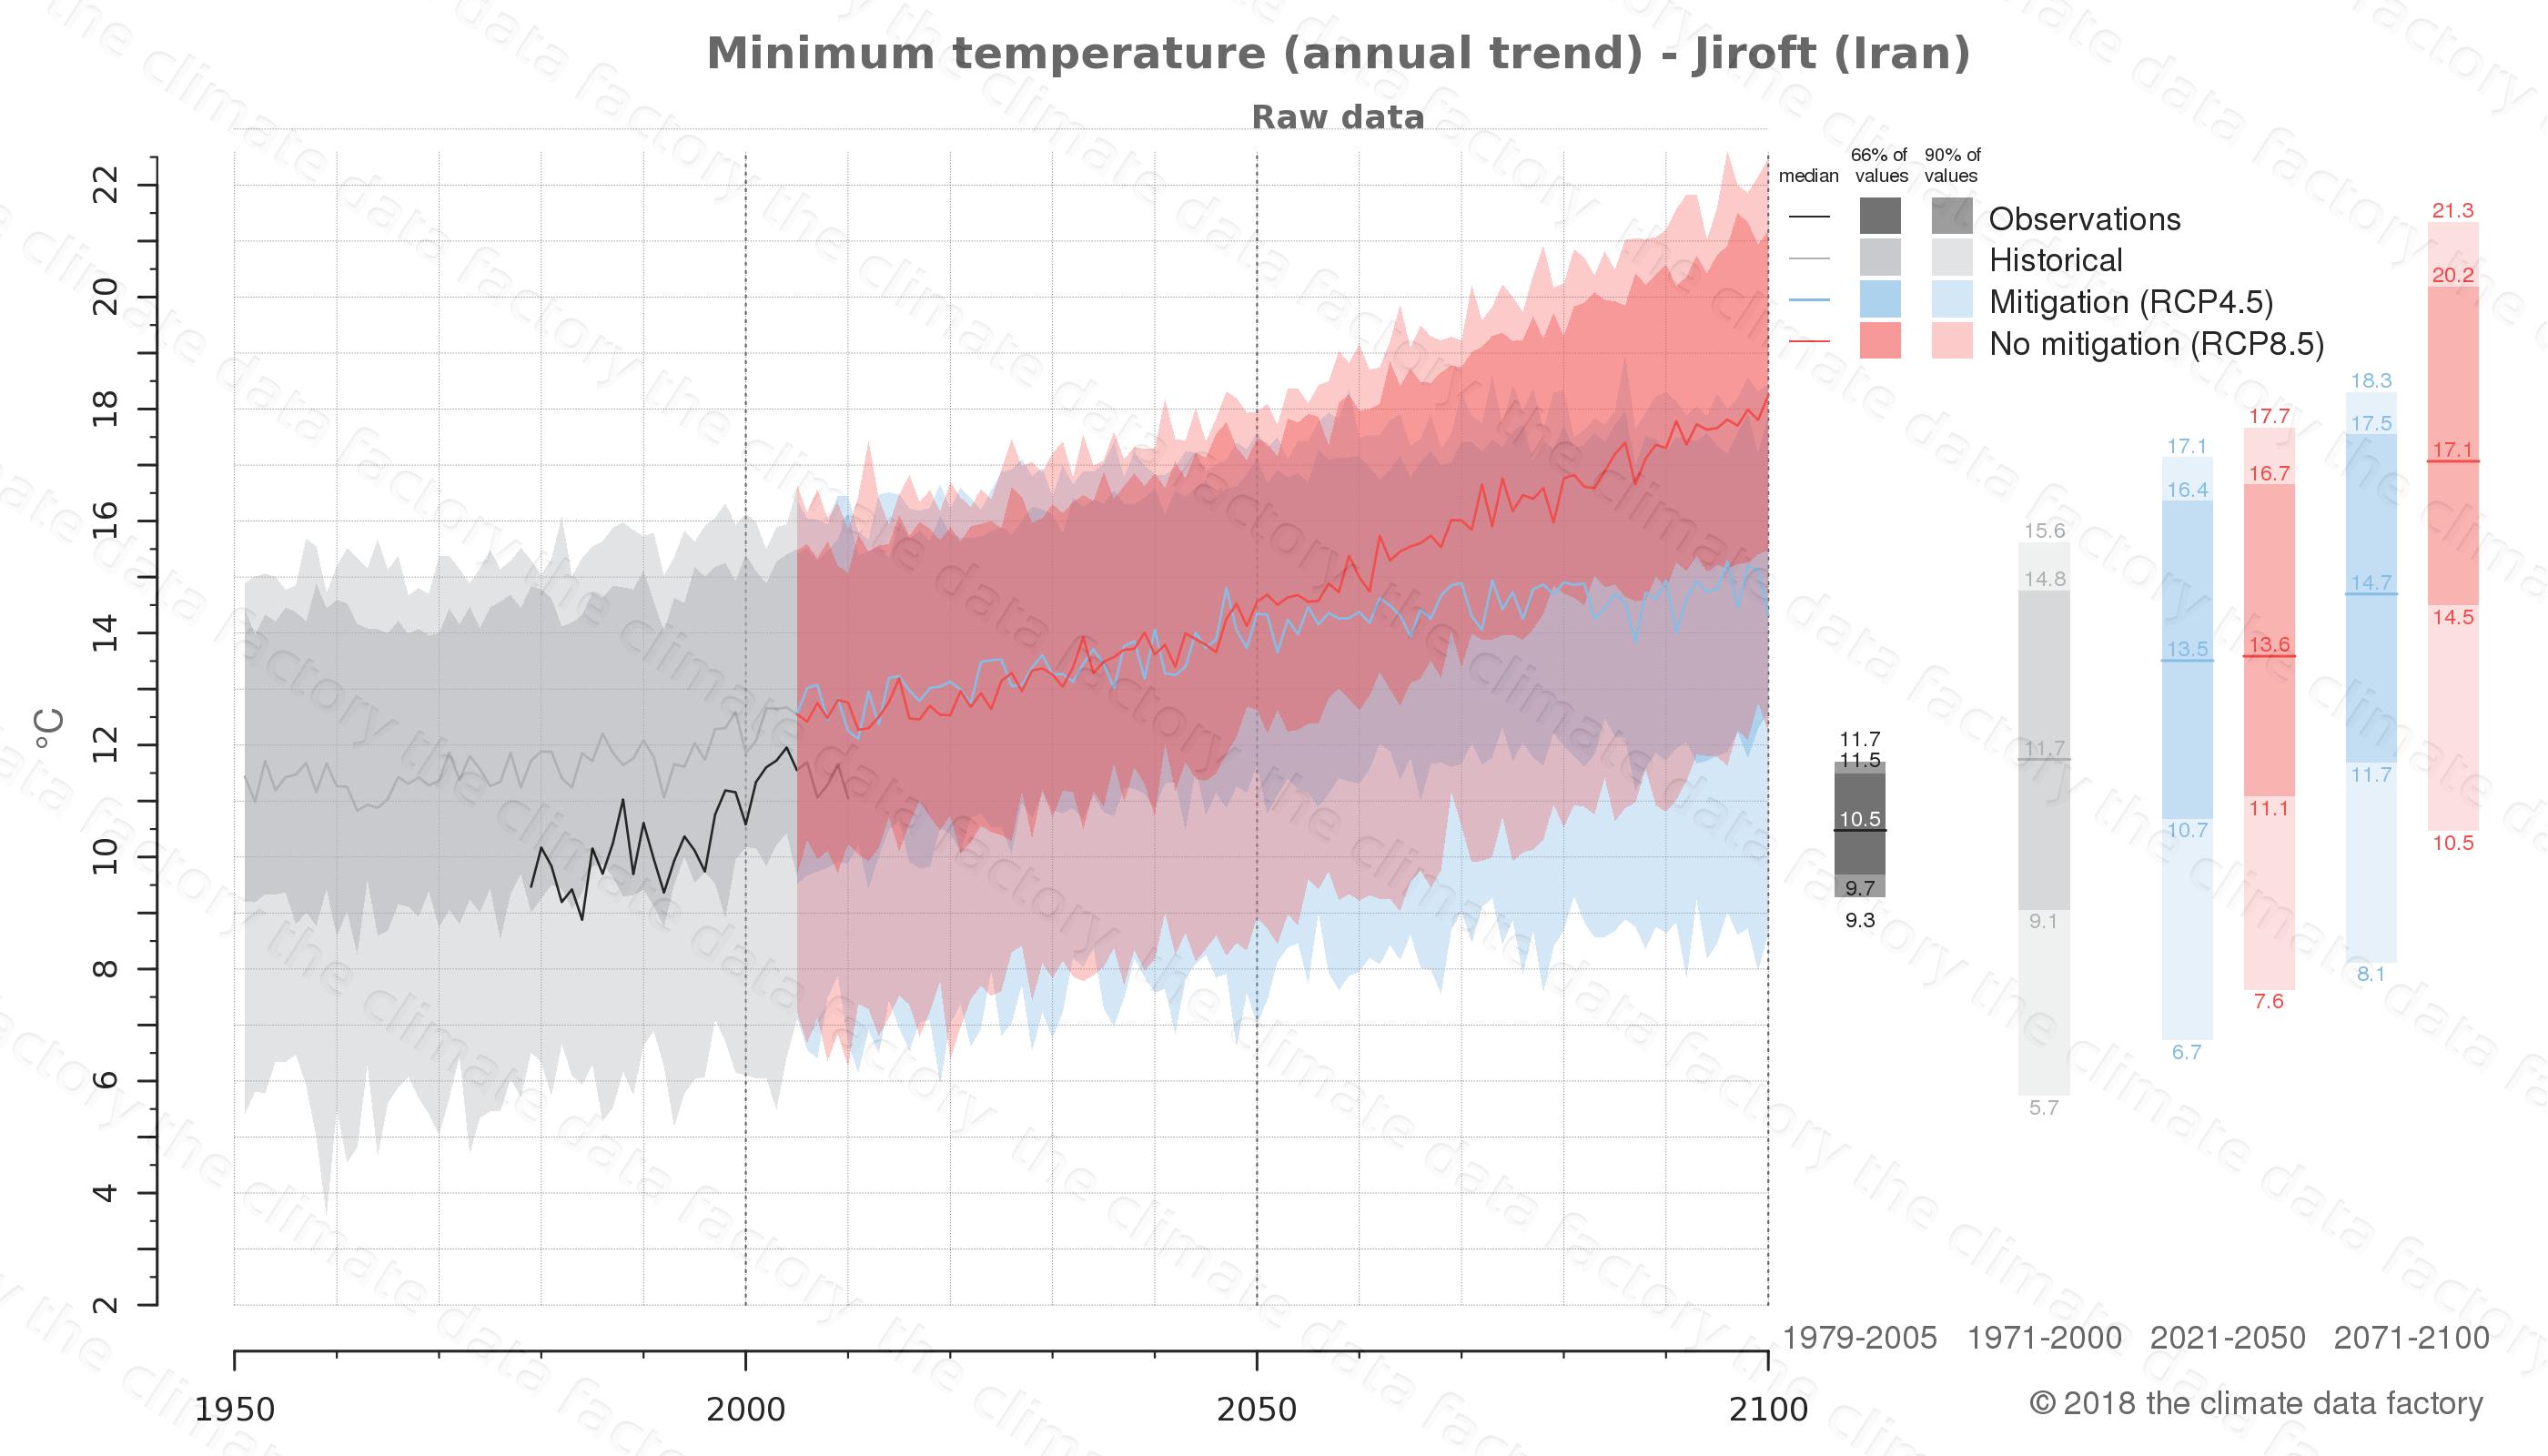 climate change data policy adaptation climate graph city data minimum-temperature jiroft iran